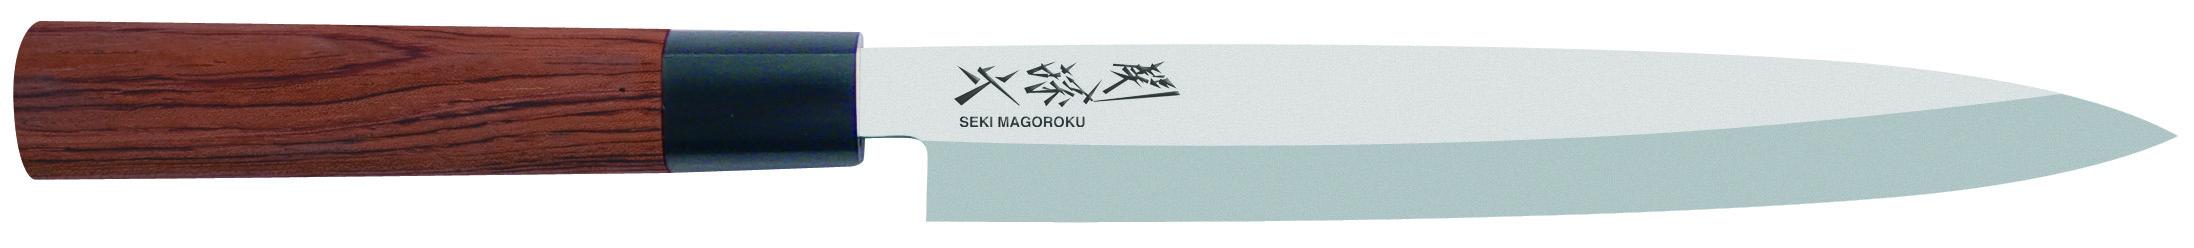 Japonský kuchynský nôž na sushi Seki Magoroku Yanagiba MGR-0210Y